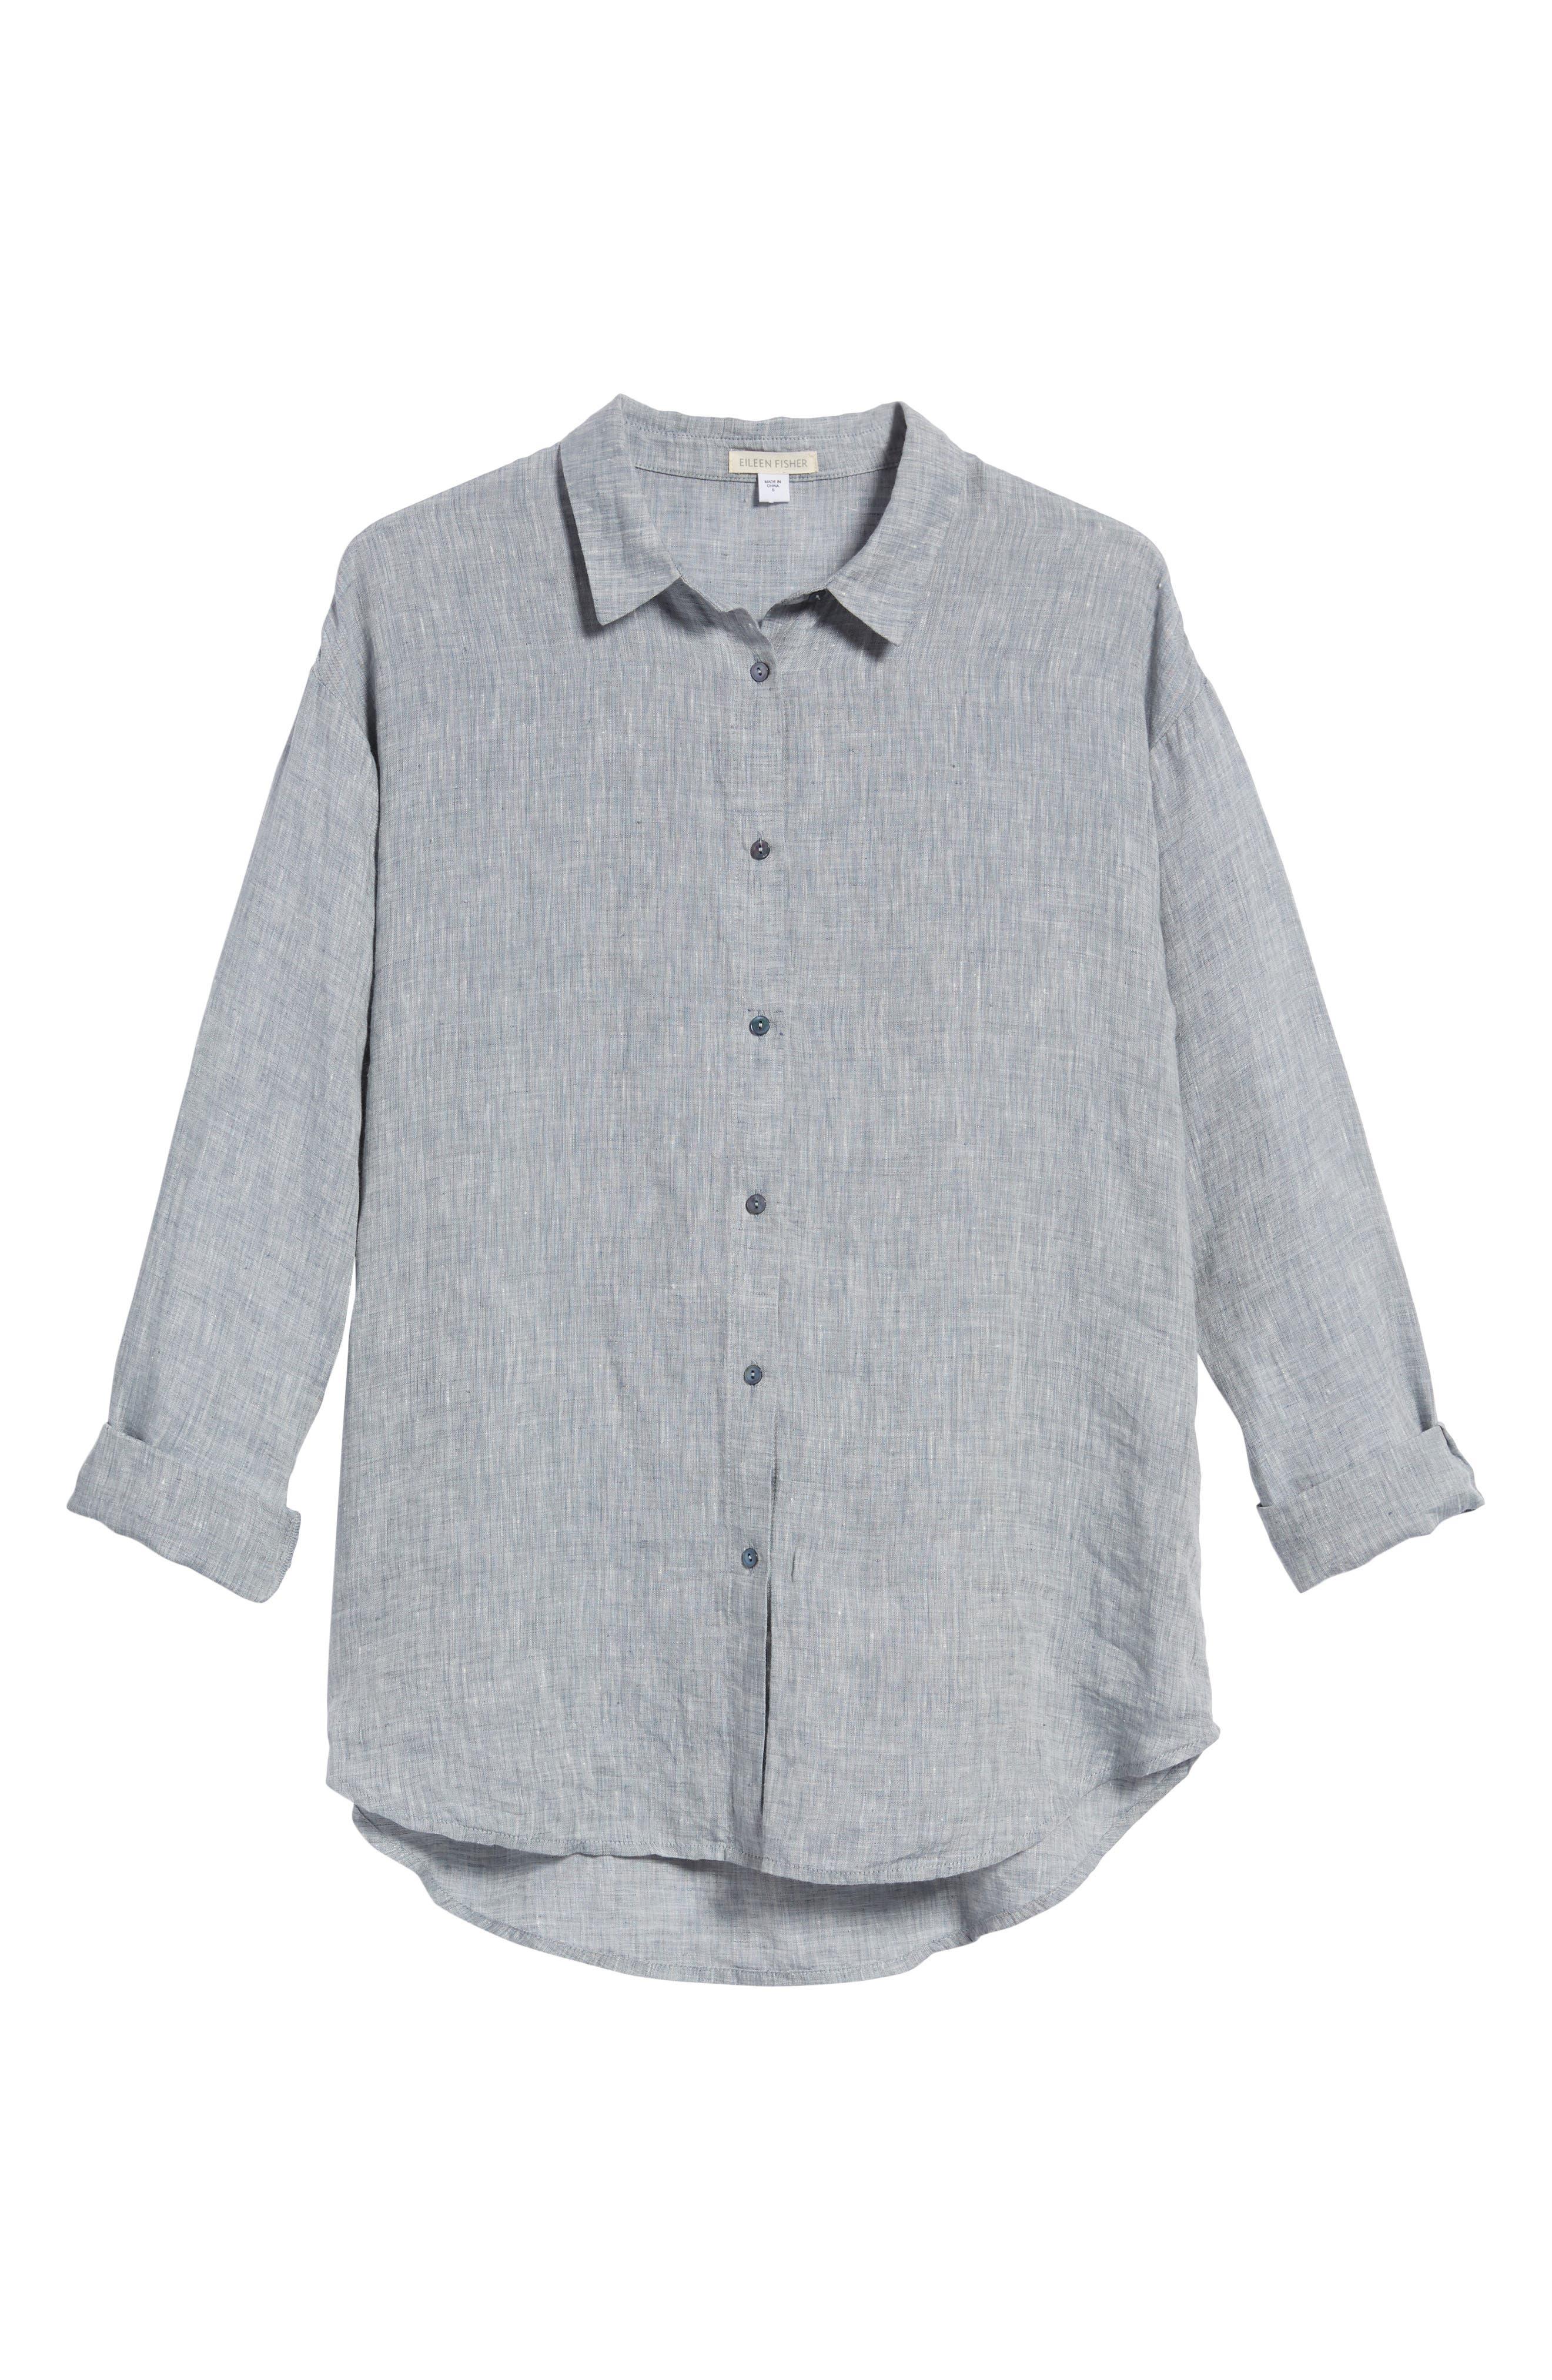 Organic Linen Shirt,                             Alternate thumbnail 13, color,